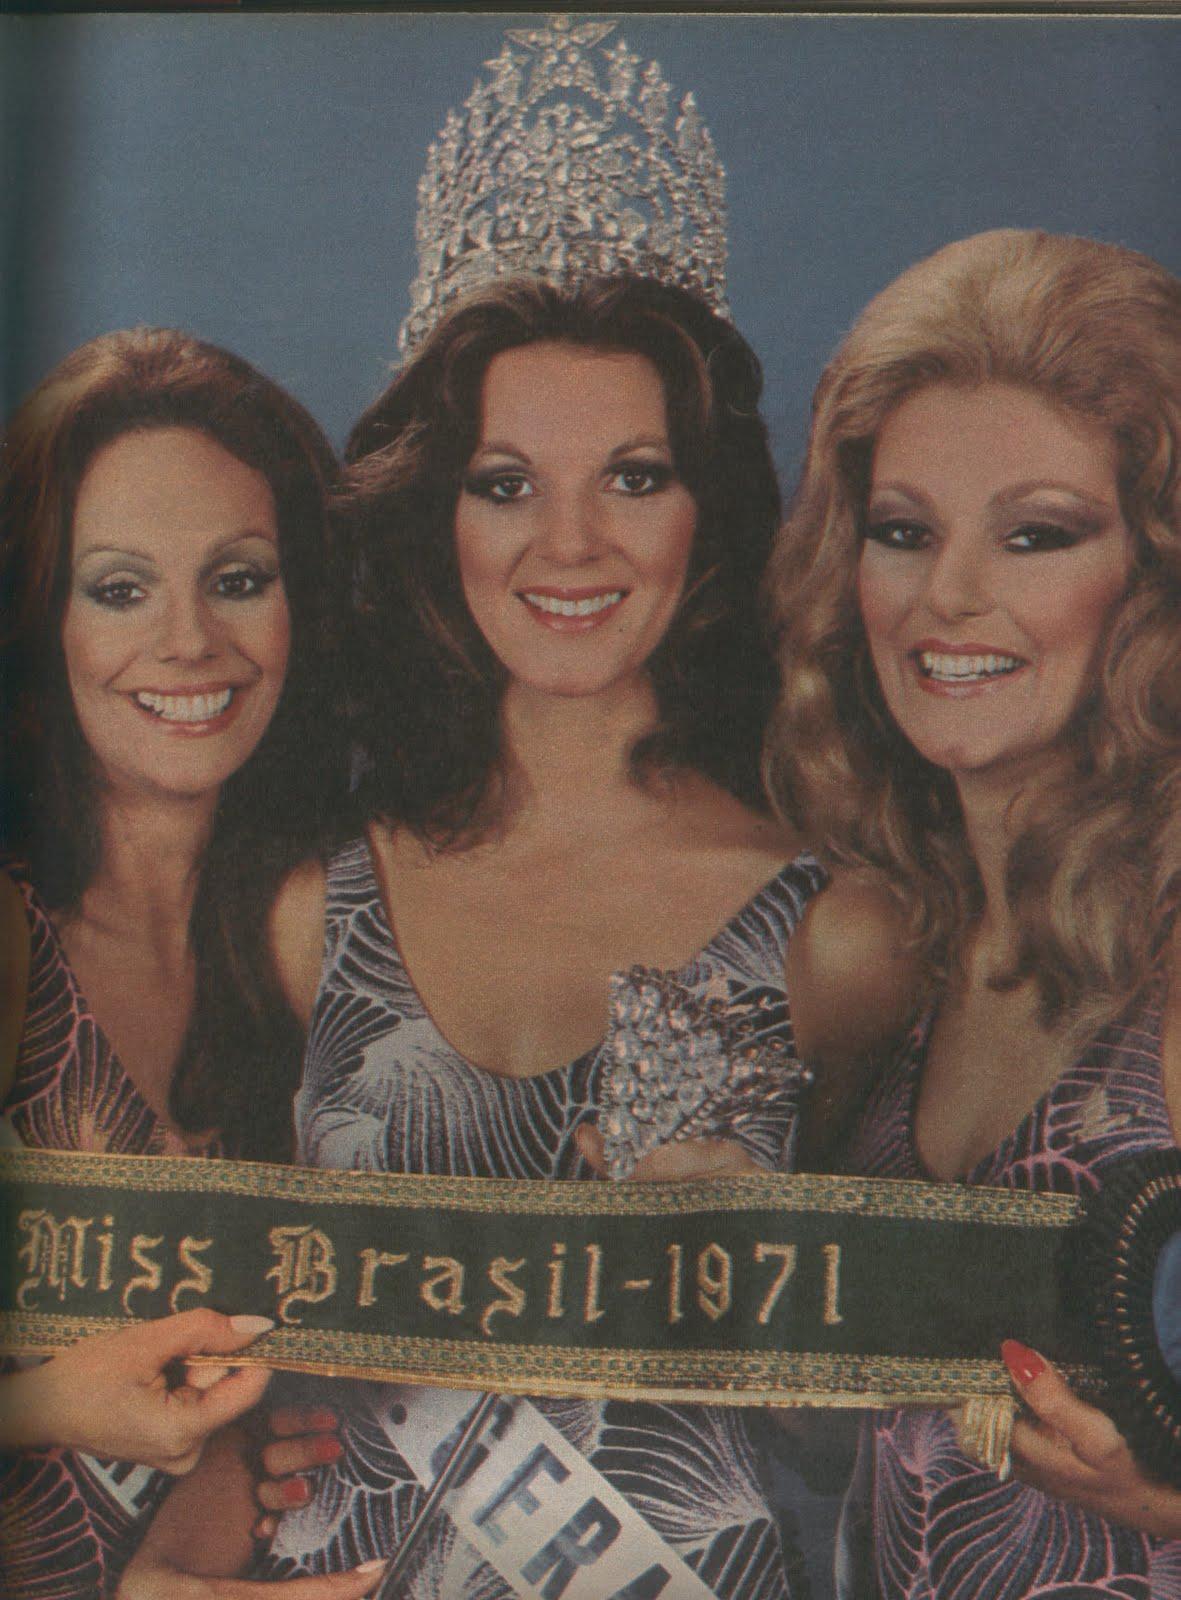 "˜*•. ˜""*°•.˜""*°••°* Lucia Petterle, Miss World 1971. ˜*•. ˜""*°•.˜""*°••°* Lucia-766"